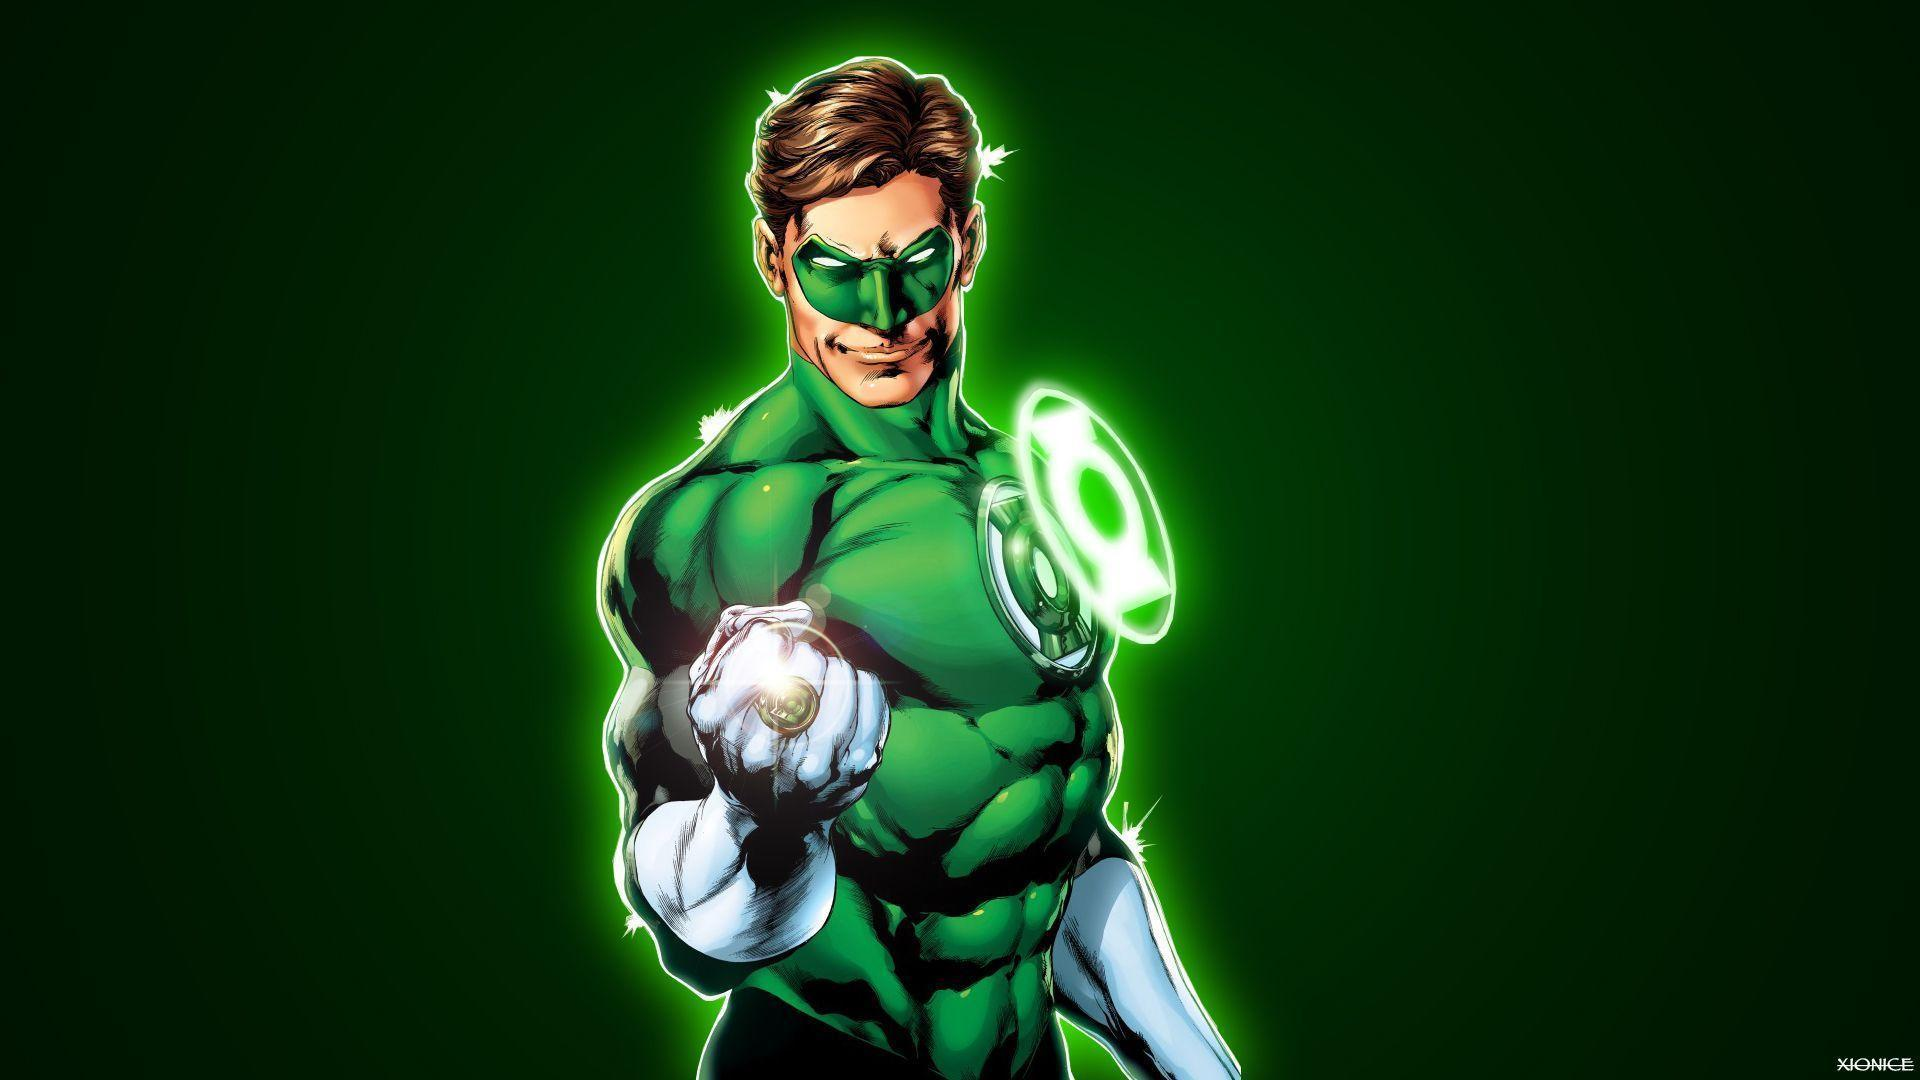 green lantern artwork wallpaper - photo #5